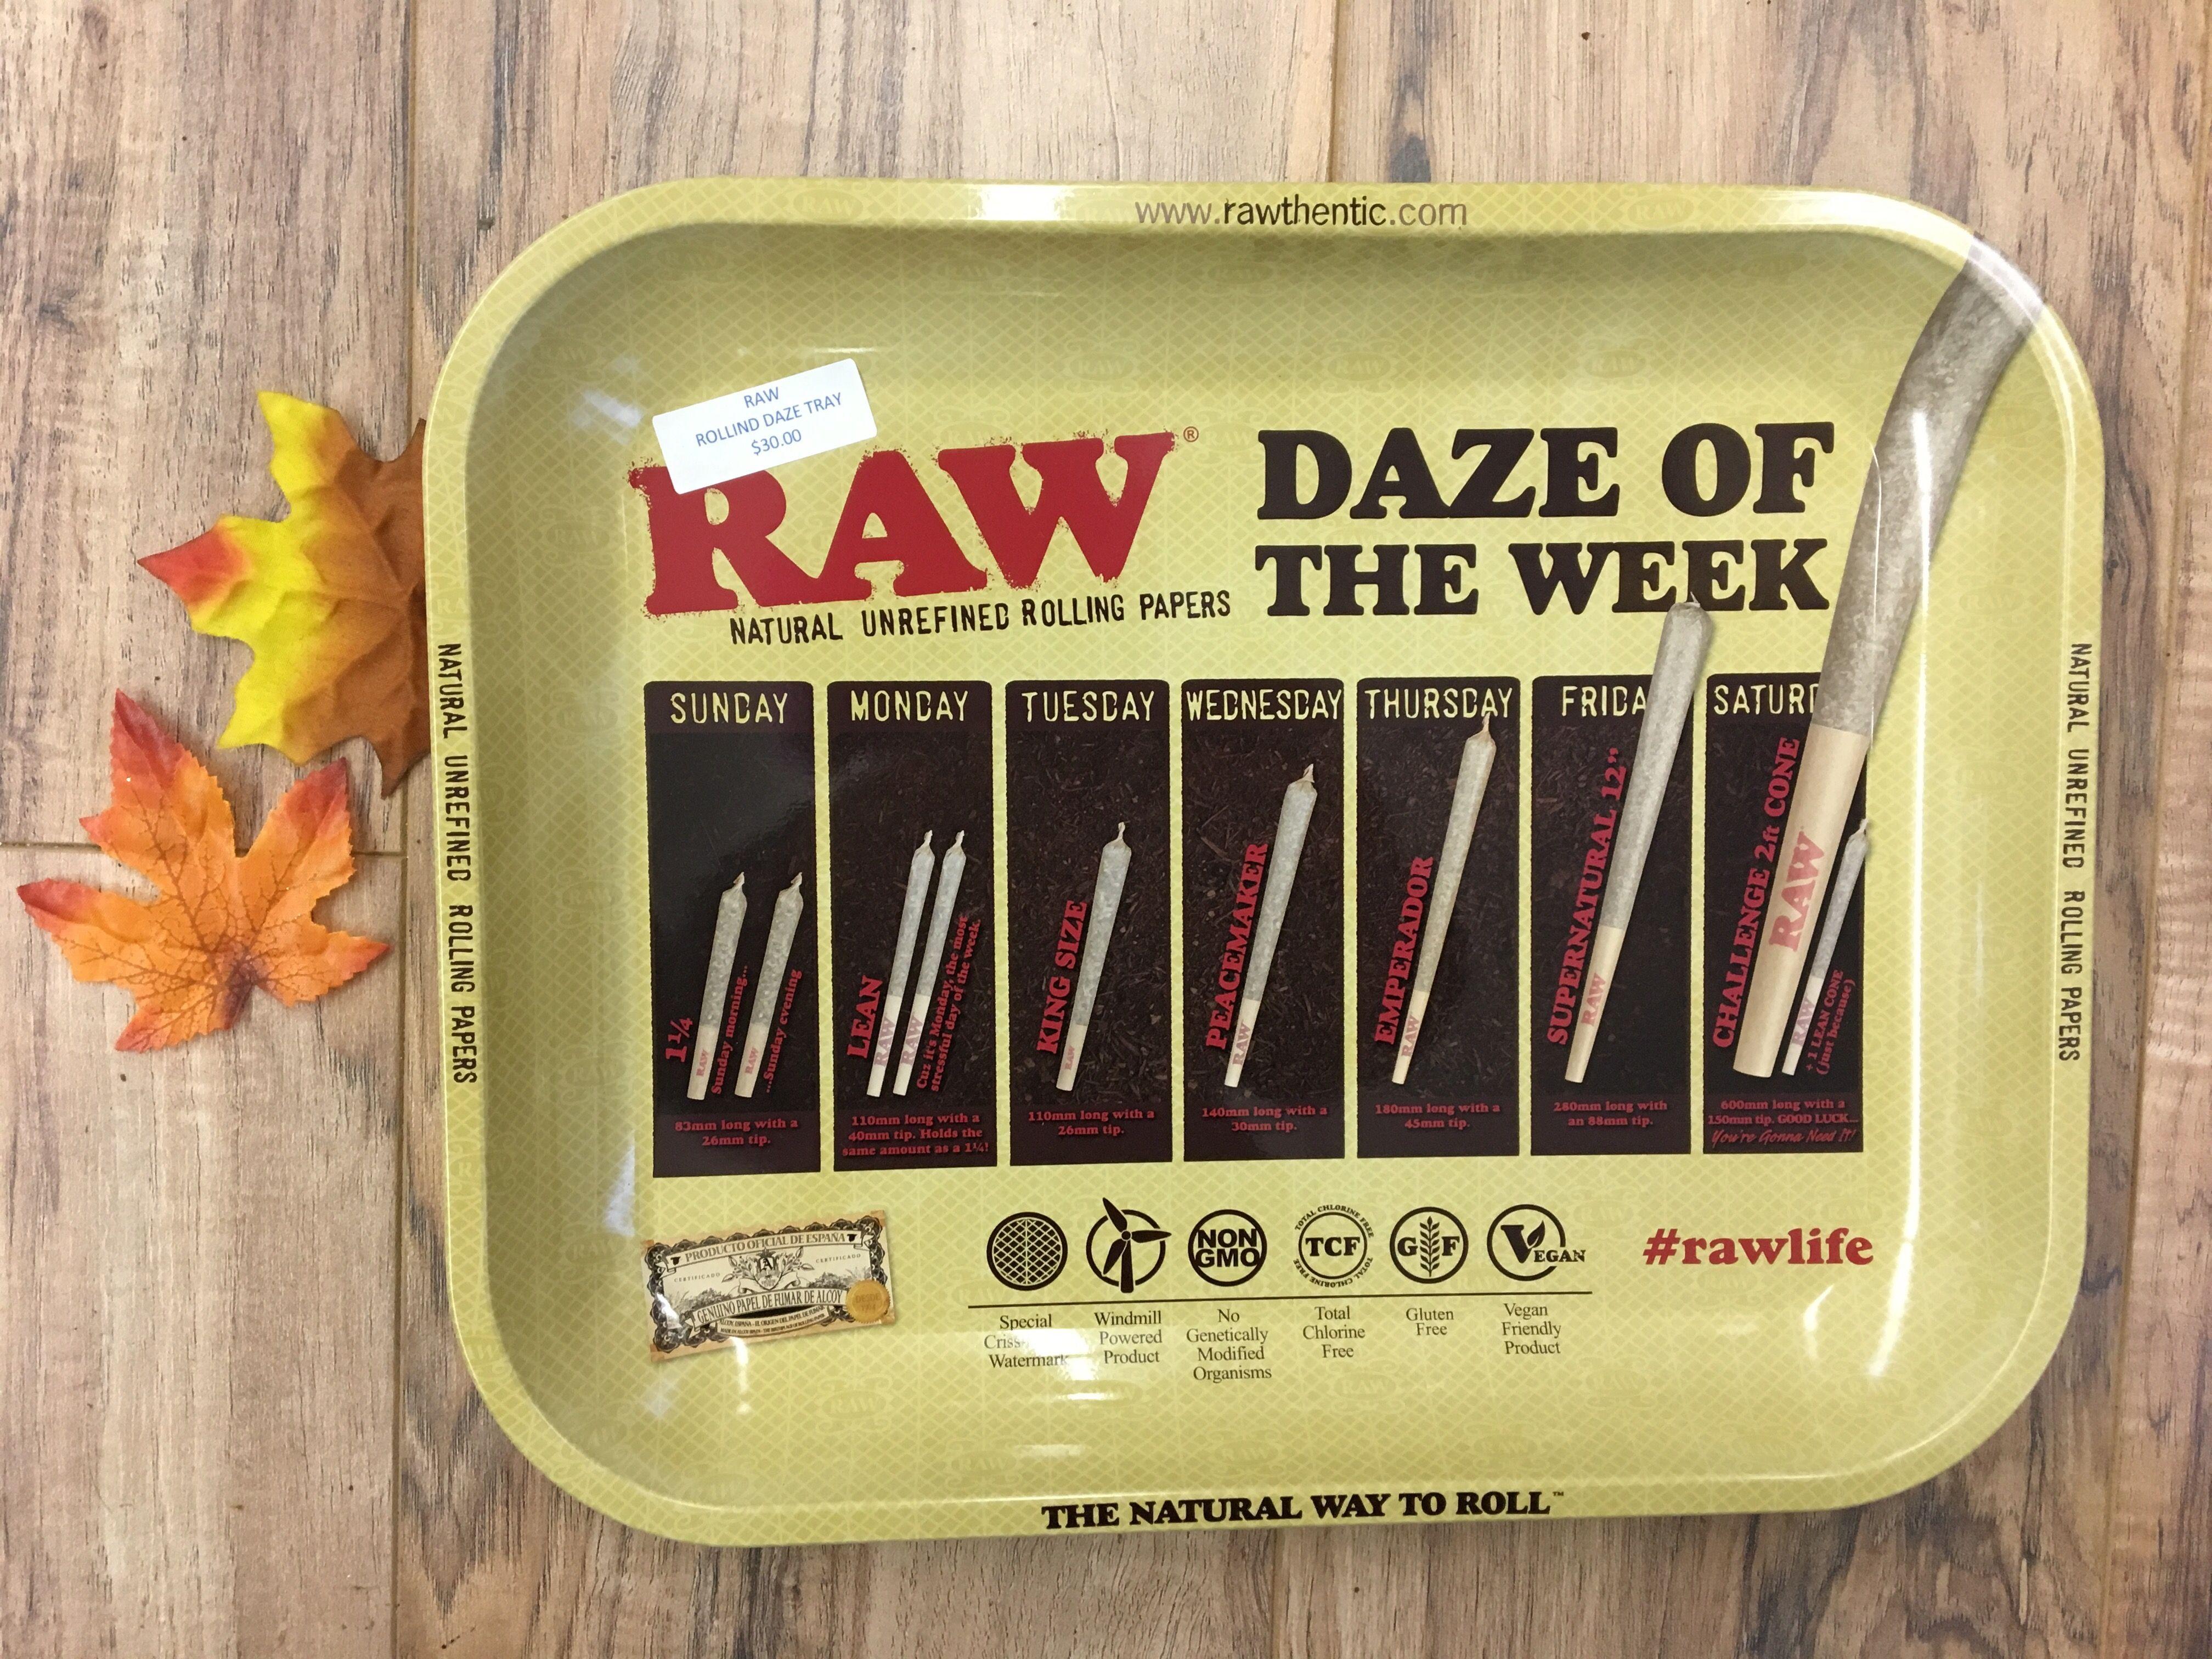 3745a13d7ada4 Daze of the Week RAW Rolling Tray #RAW #rawthentic #daze #week ...